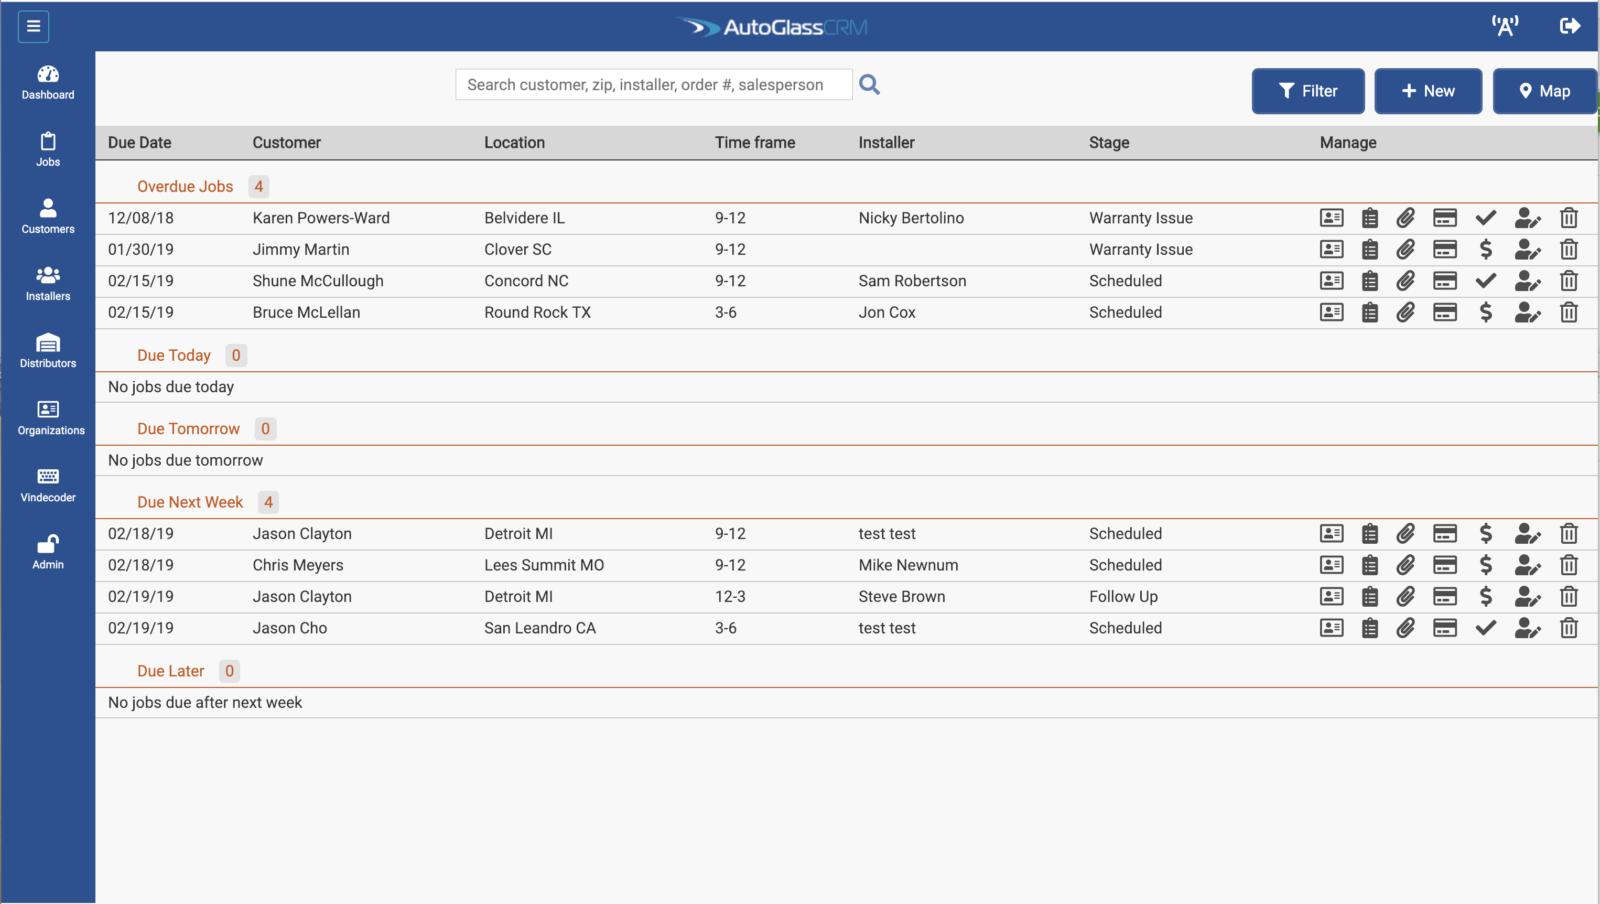 AutoGlassCRM Jobs Page Screenshot